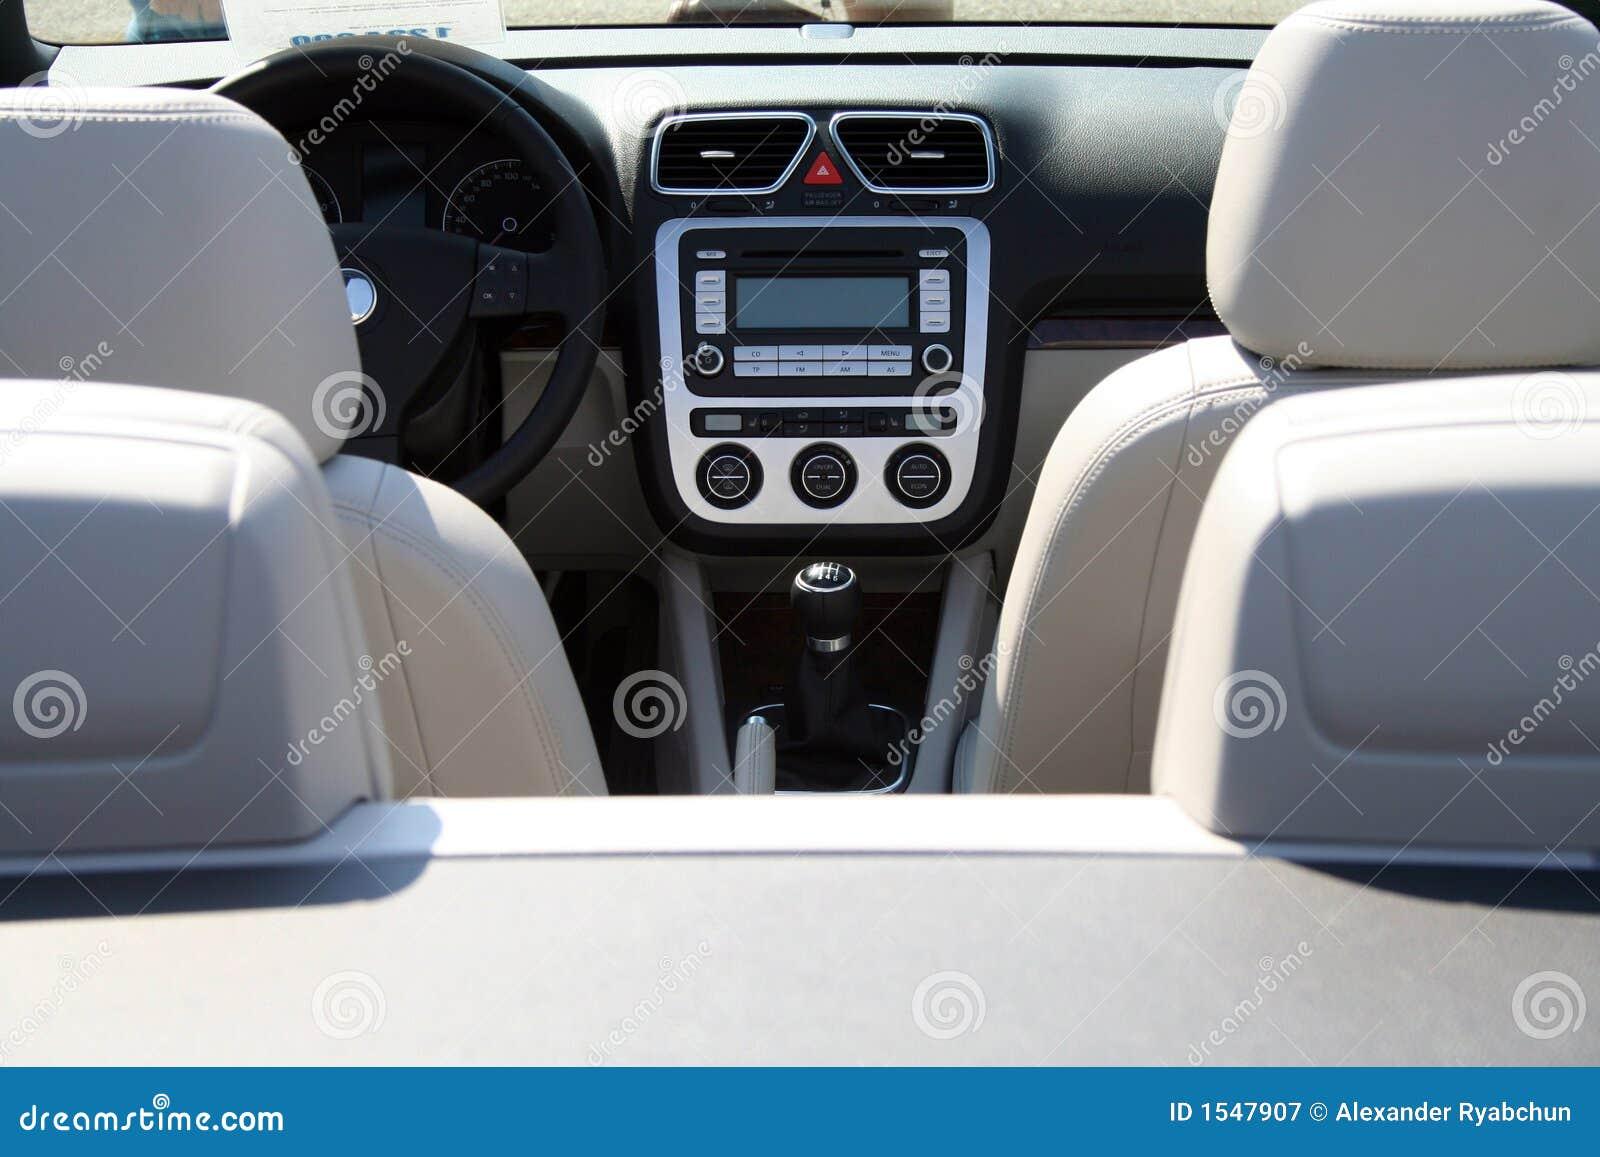 Cabriolet meter panel rudder seats